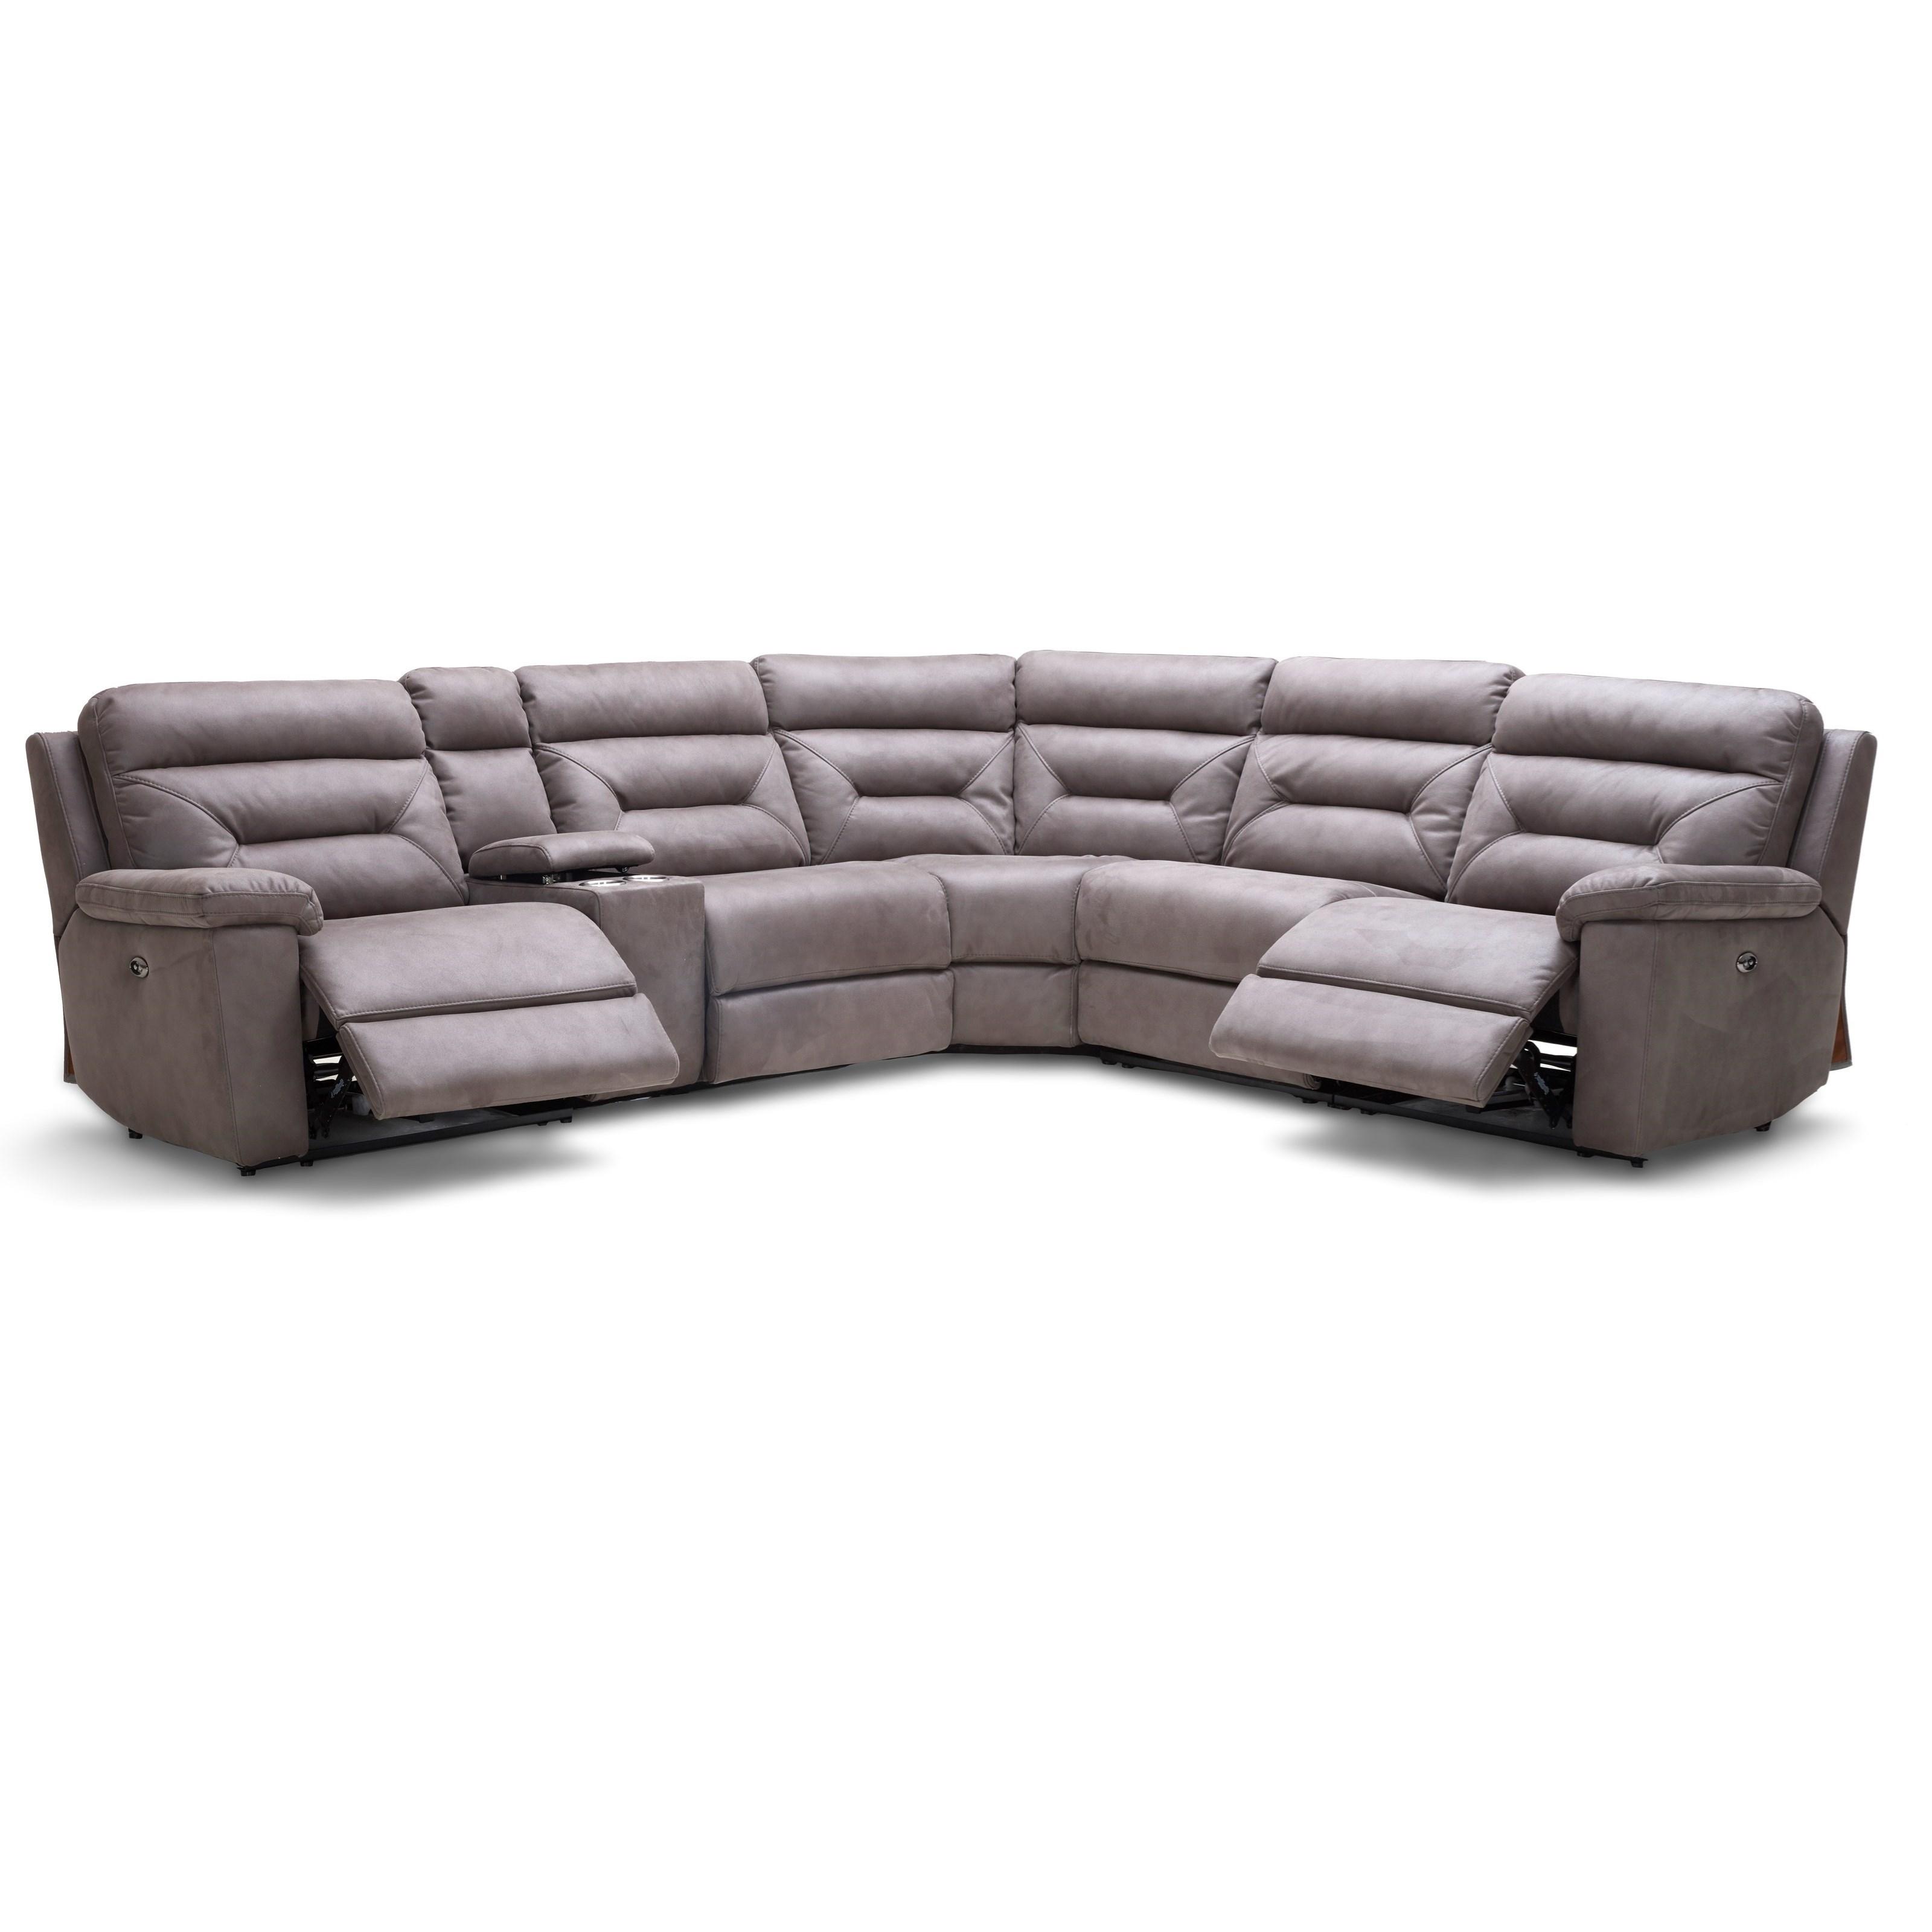 Kuka Home Km012 Six Piece Reclining Sectional Sofa With